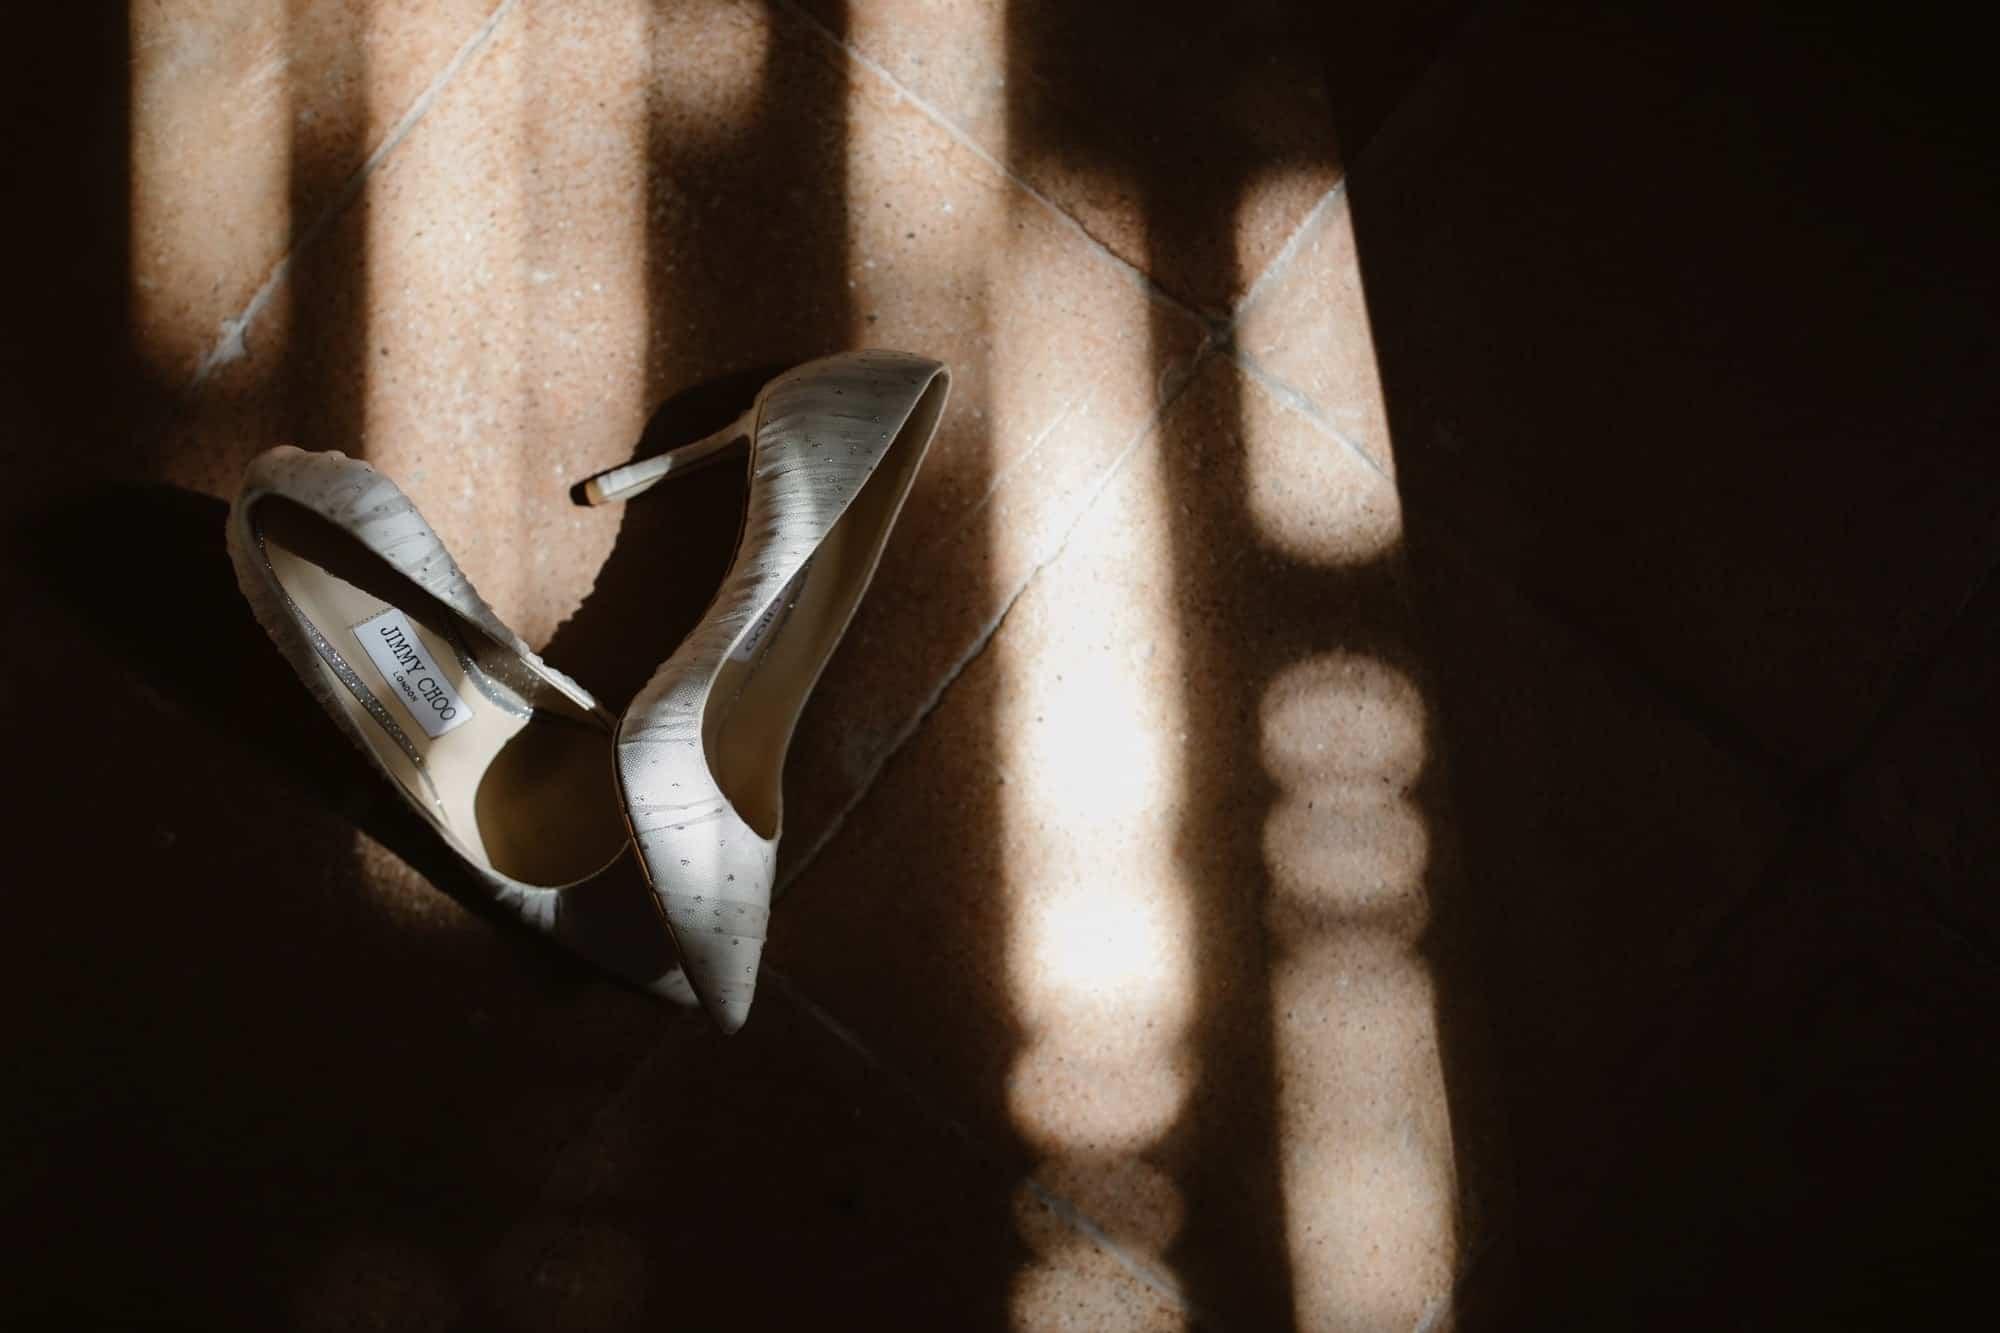 pair of Jimmy Choo Wedding Shoes